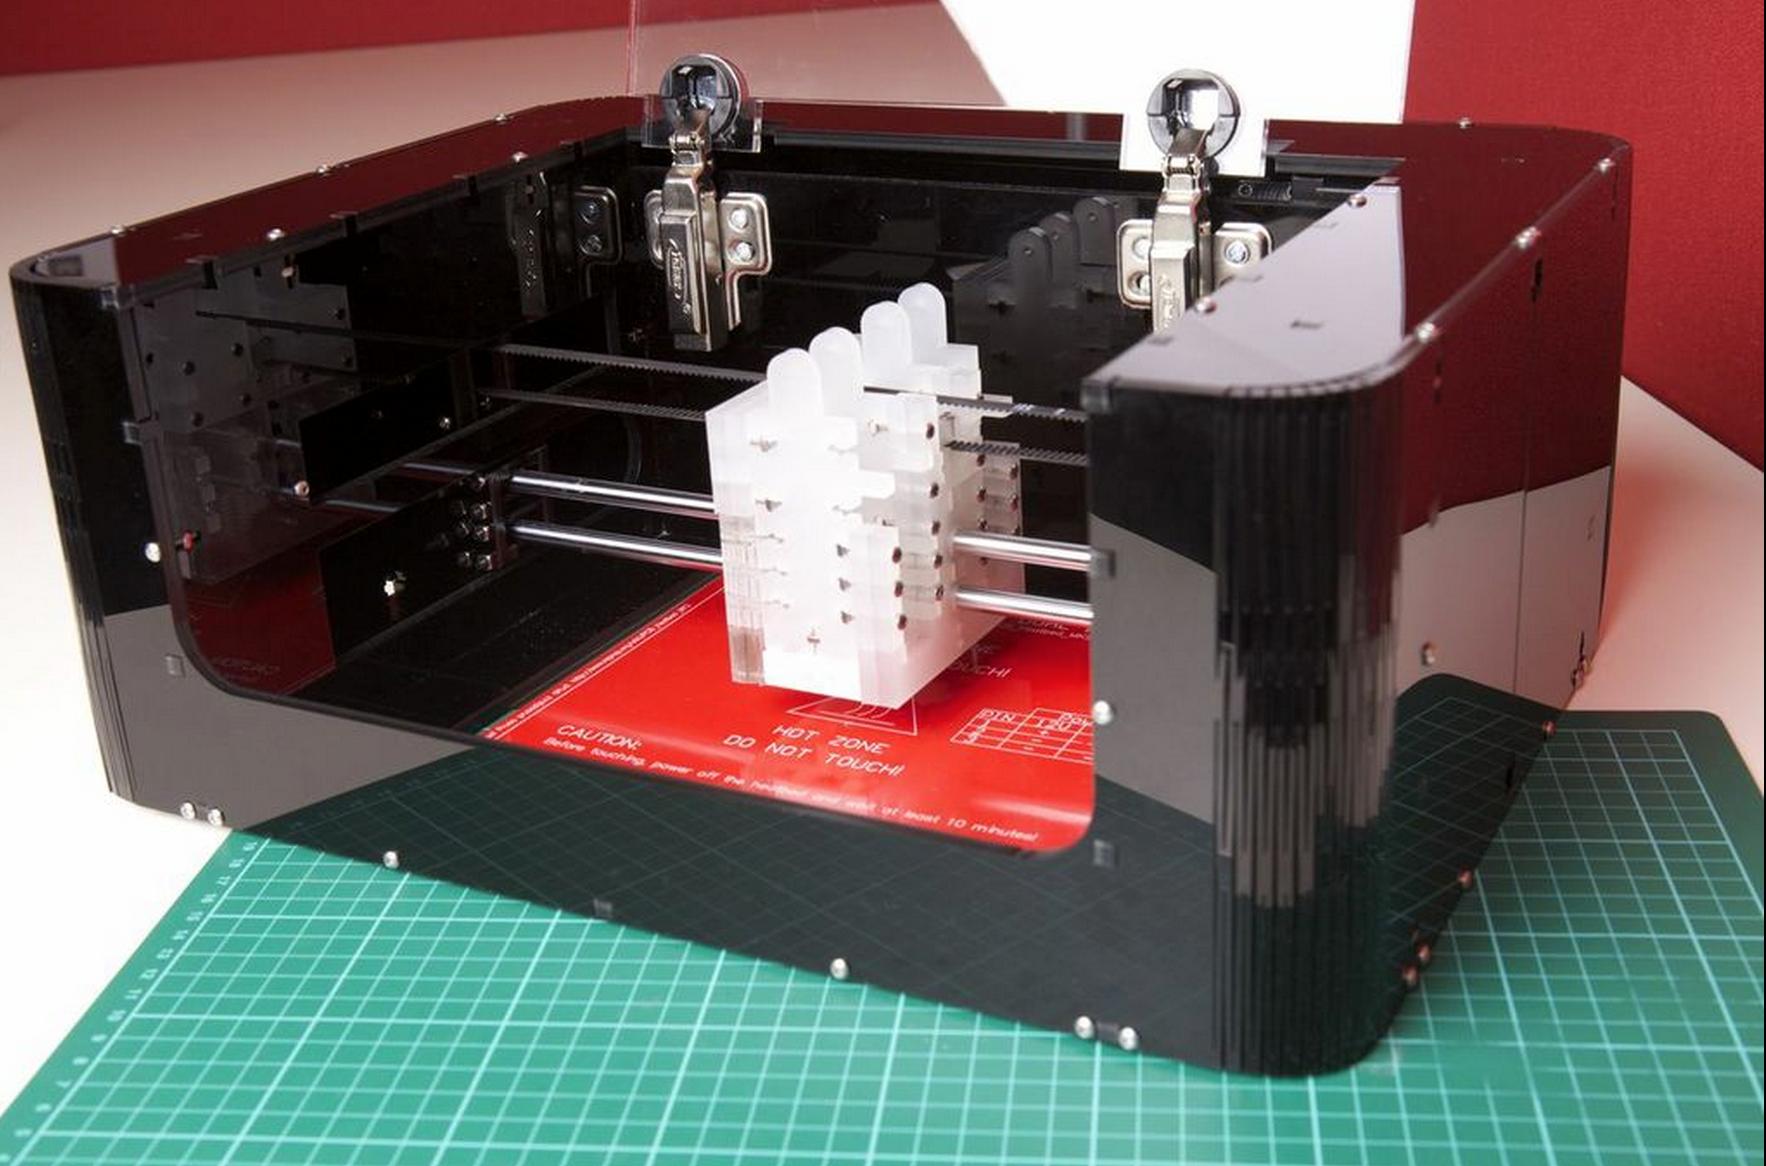 personal circuit printer surpasses kickstarter goal in one day \u2013 gigaomex¹ circuit 3d printer printed electronics